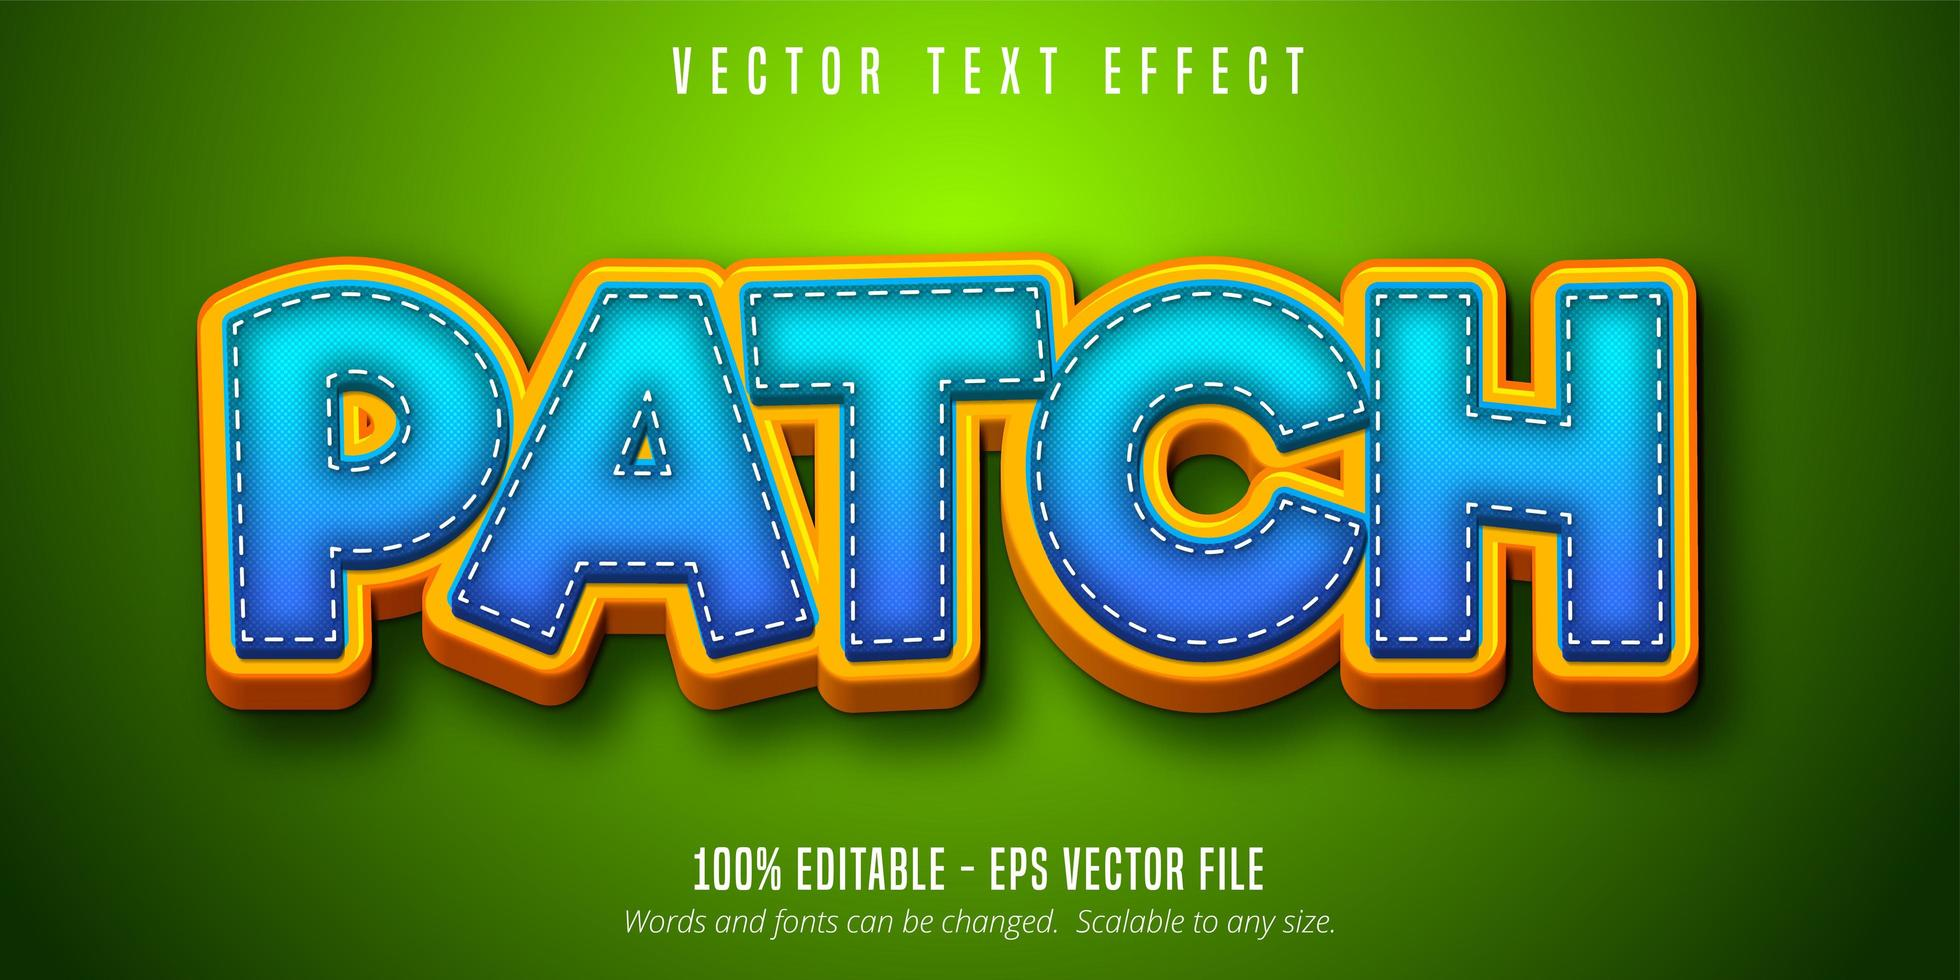 patch text, efeito de texto estilo cartoon vetor